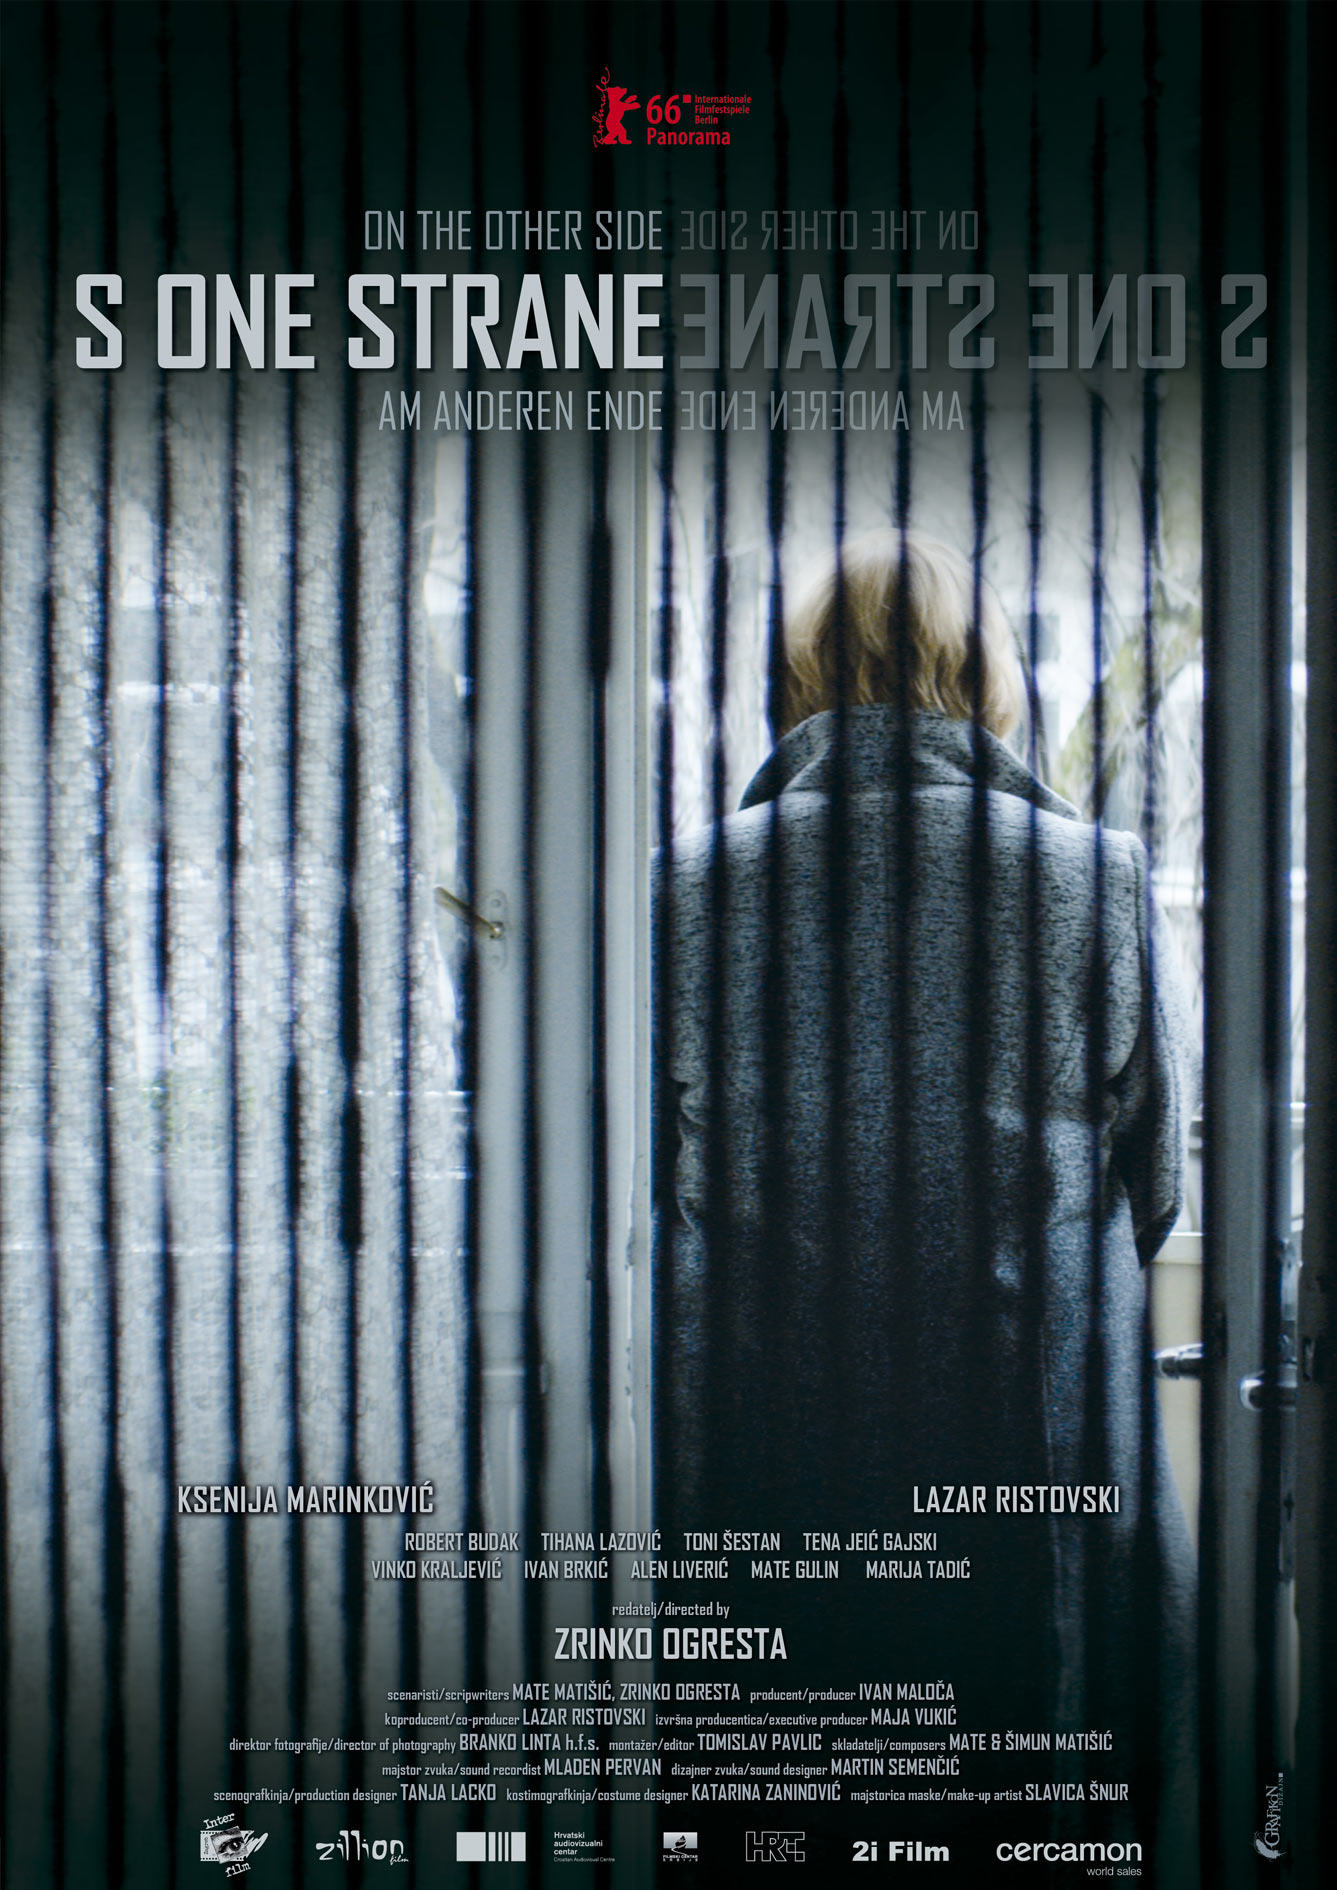 S_one_strane_plakat